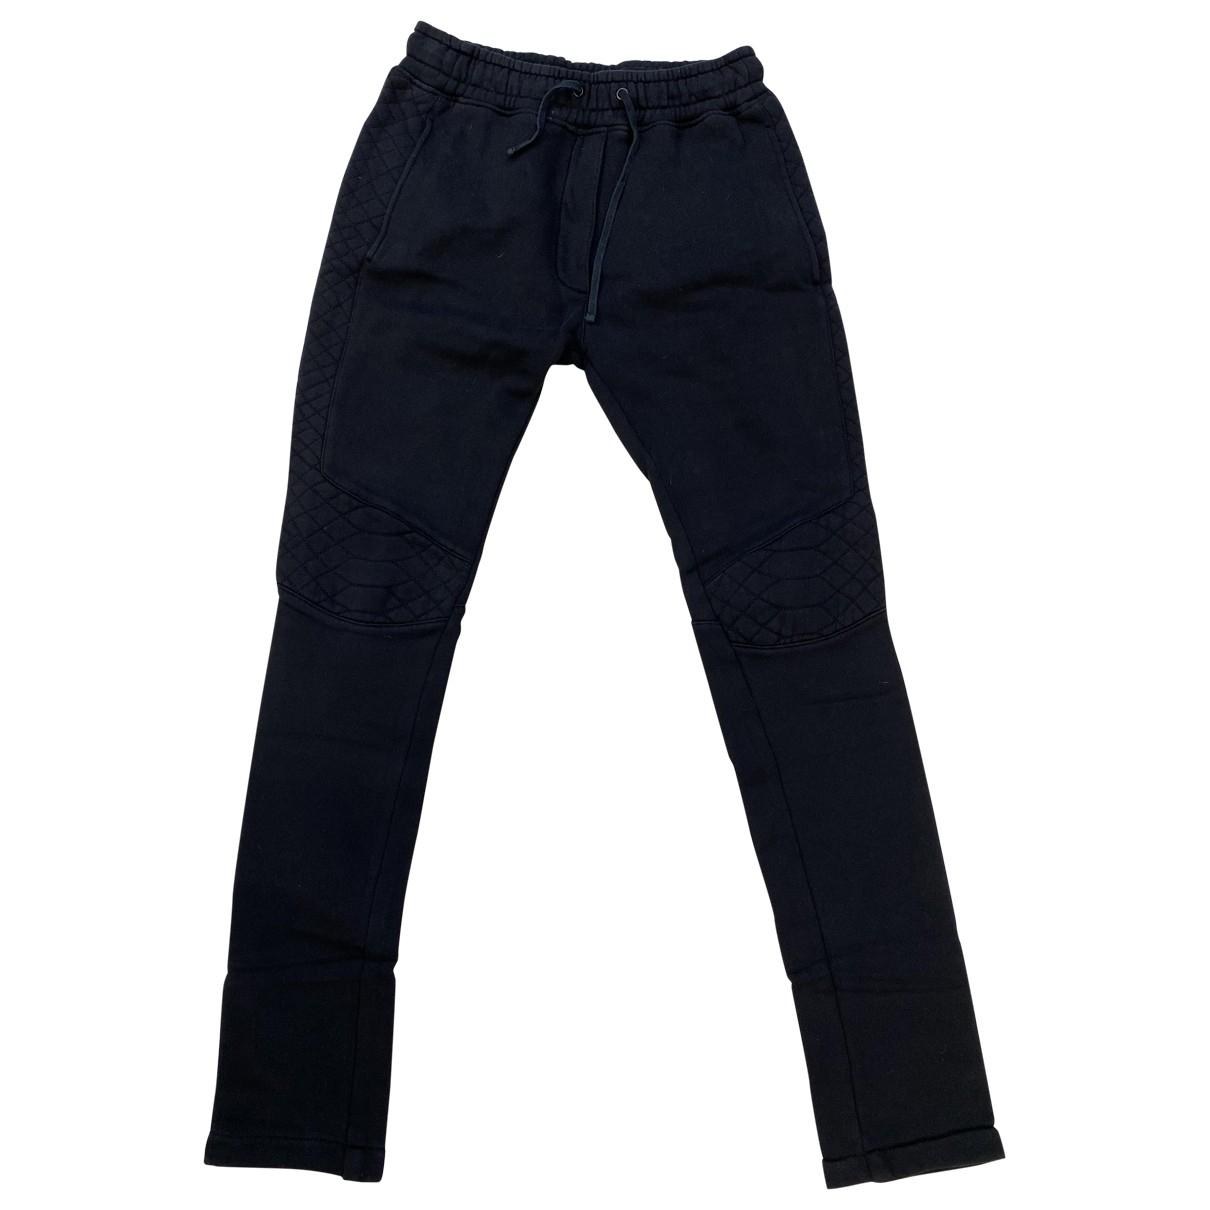 Balmain \N Black Cotton Trousers for Men S International